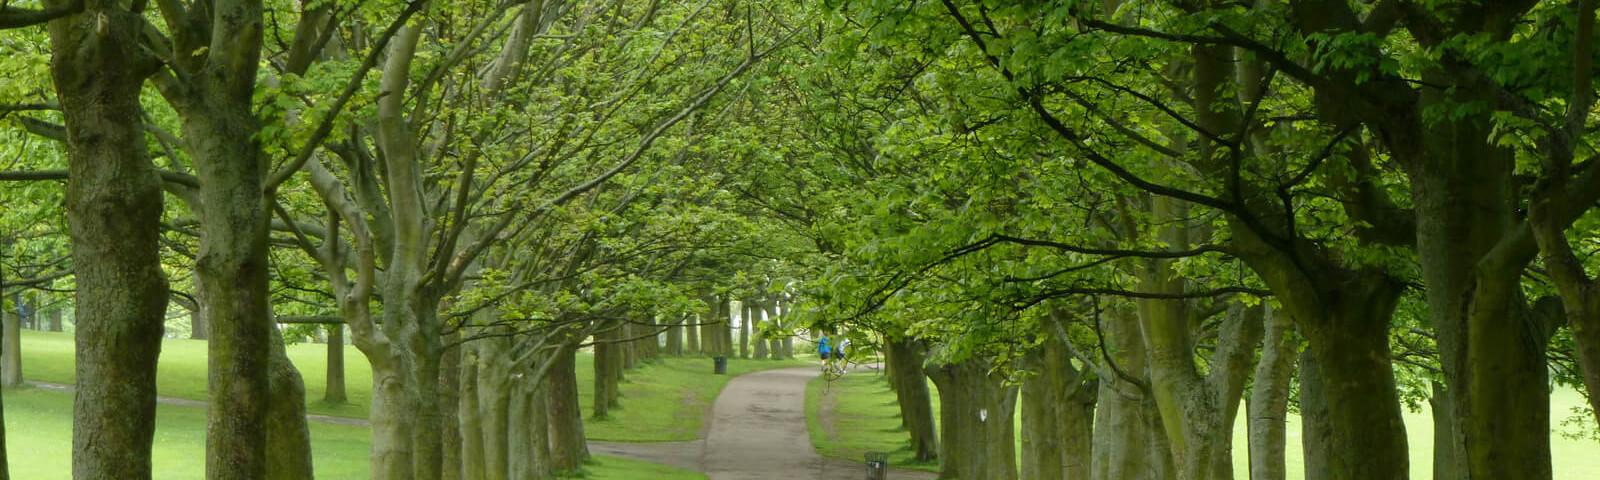 Leeds Forest